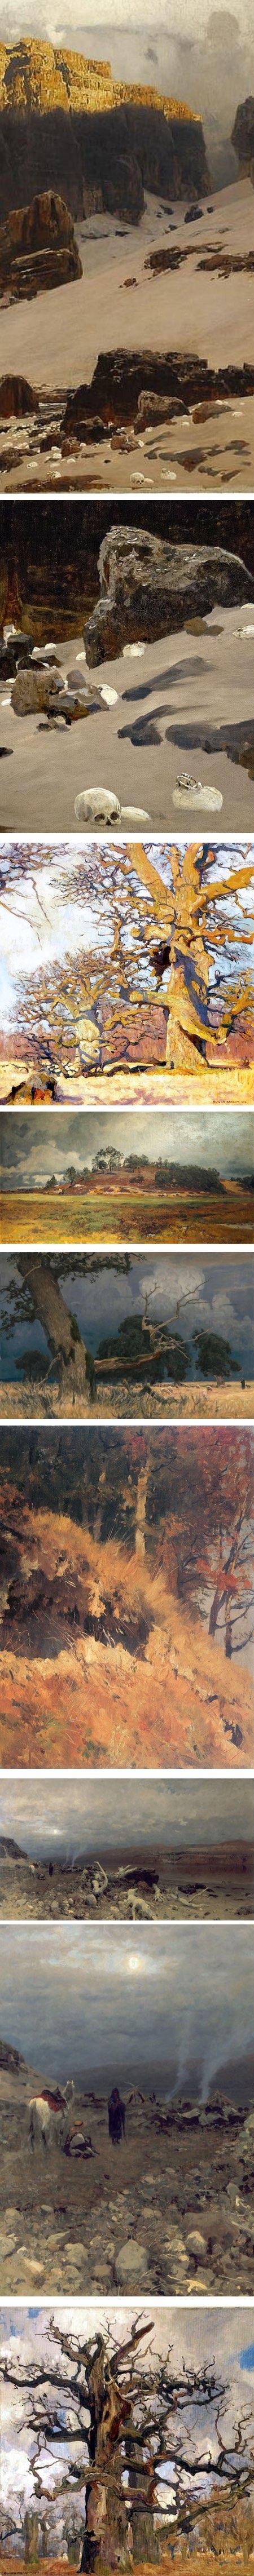 Eugen Bracht, paintings